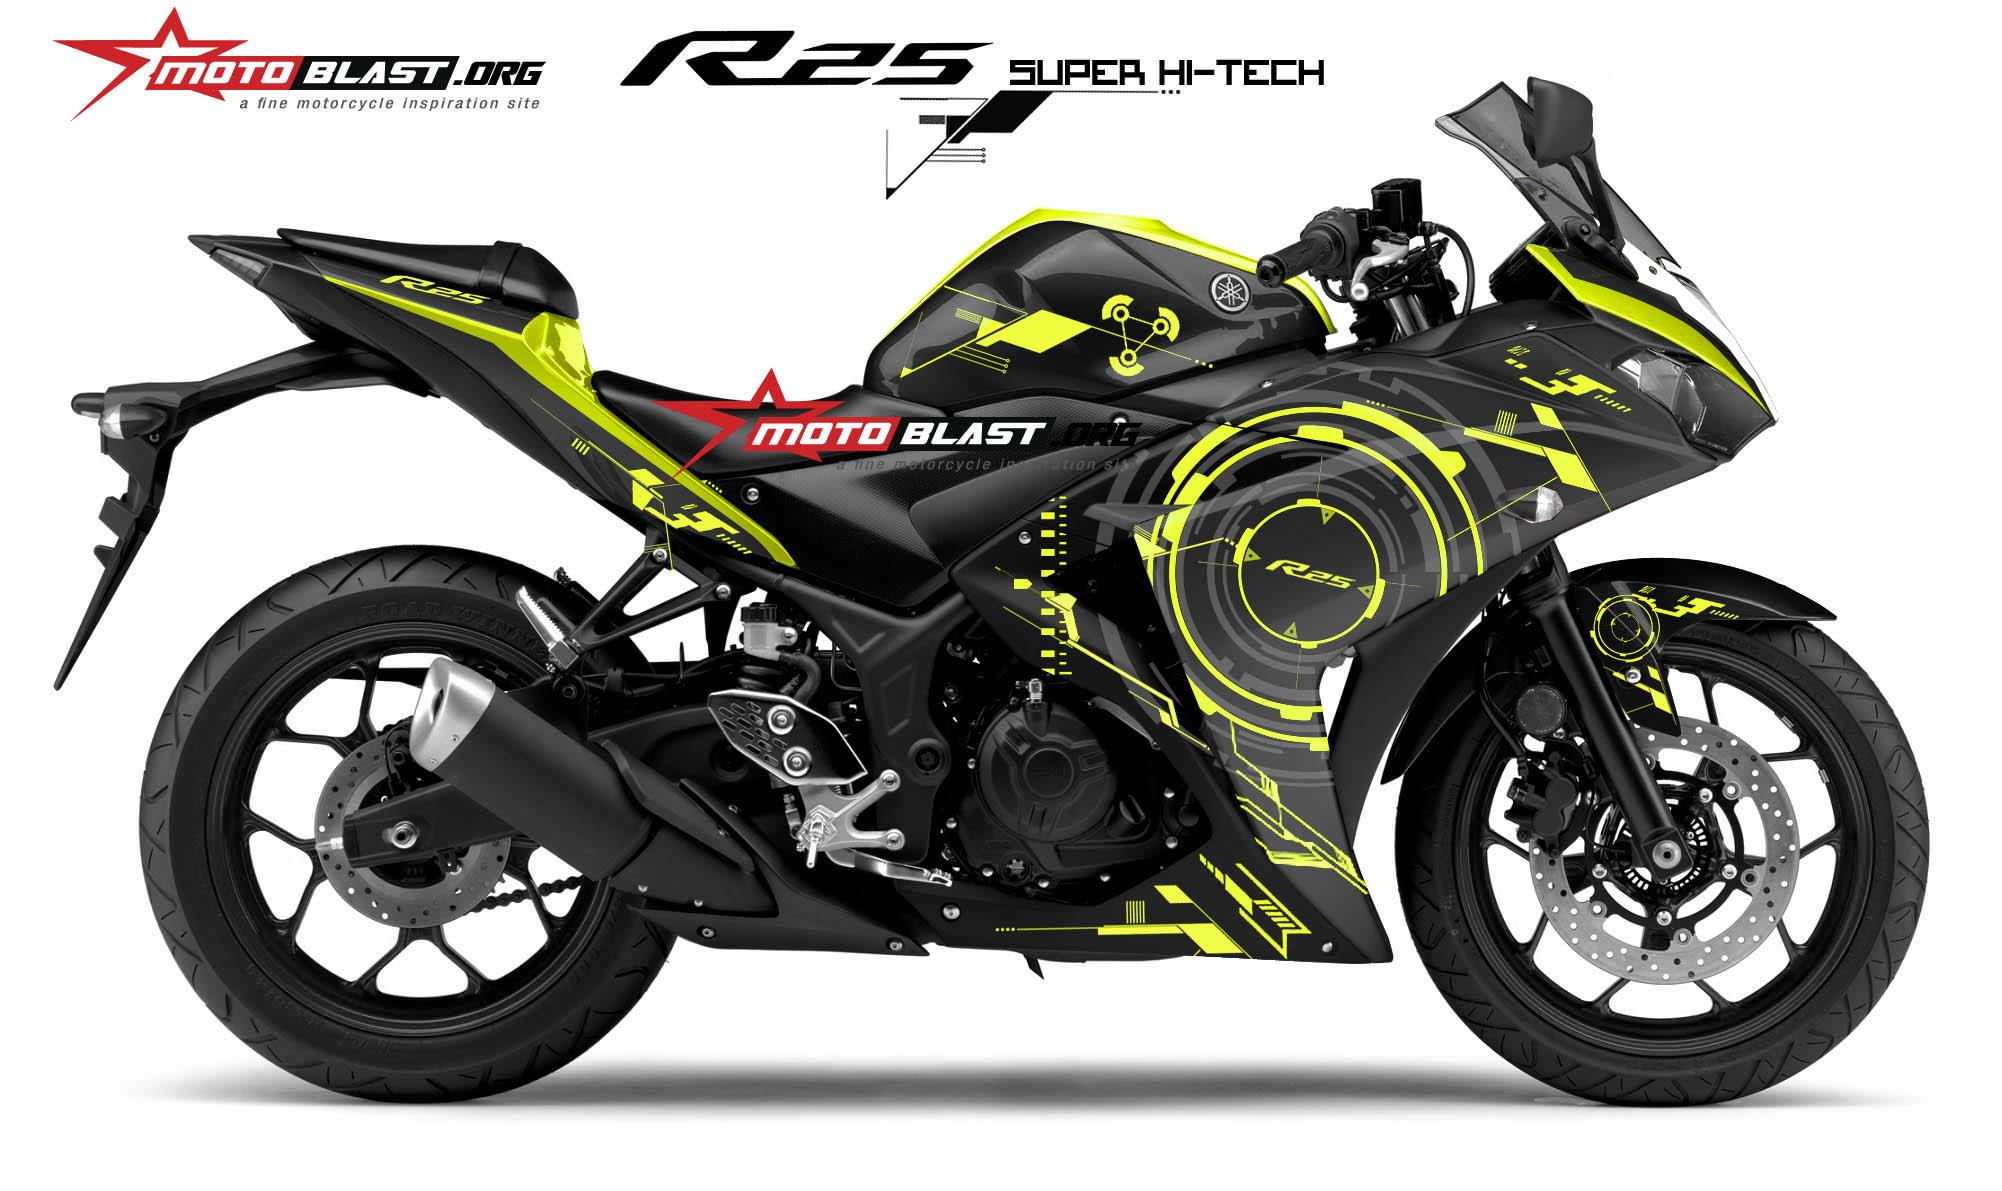 Graphic kit yamaha r25 black super hi tech motoblast